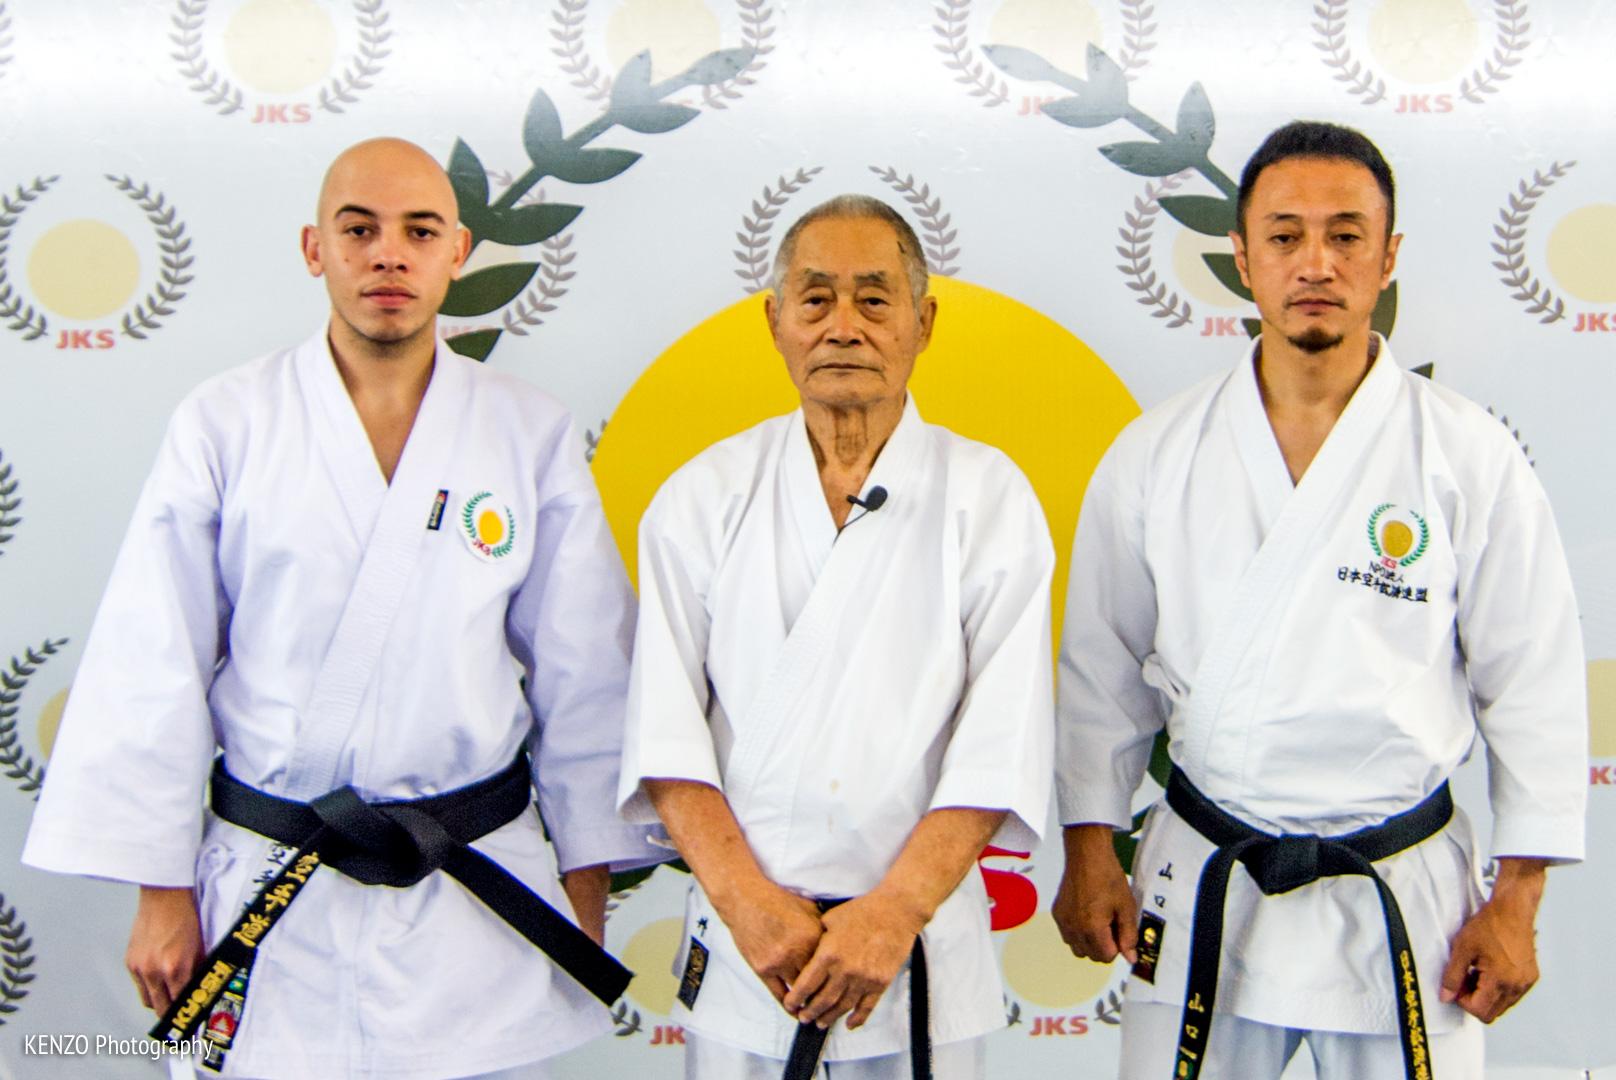 JKSPan2017-1o.dia-1.posadas-213-HT1_3243